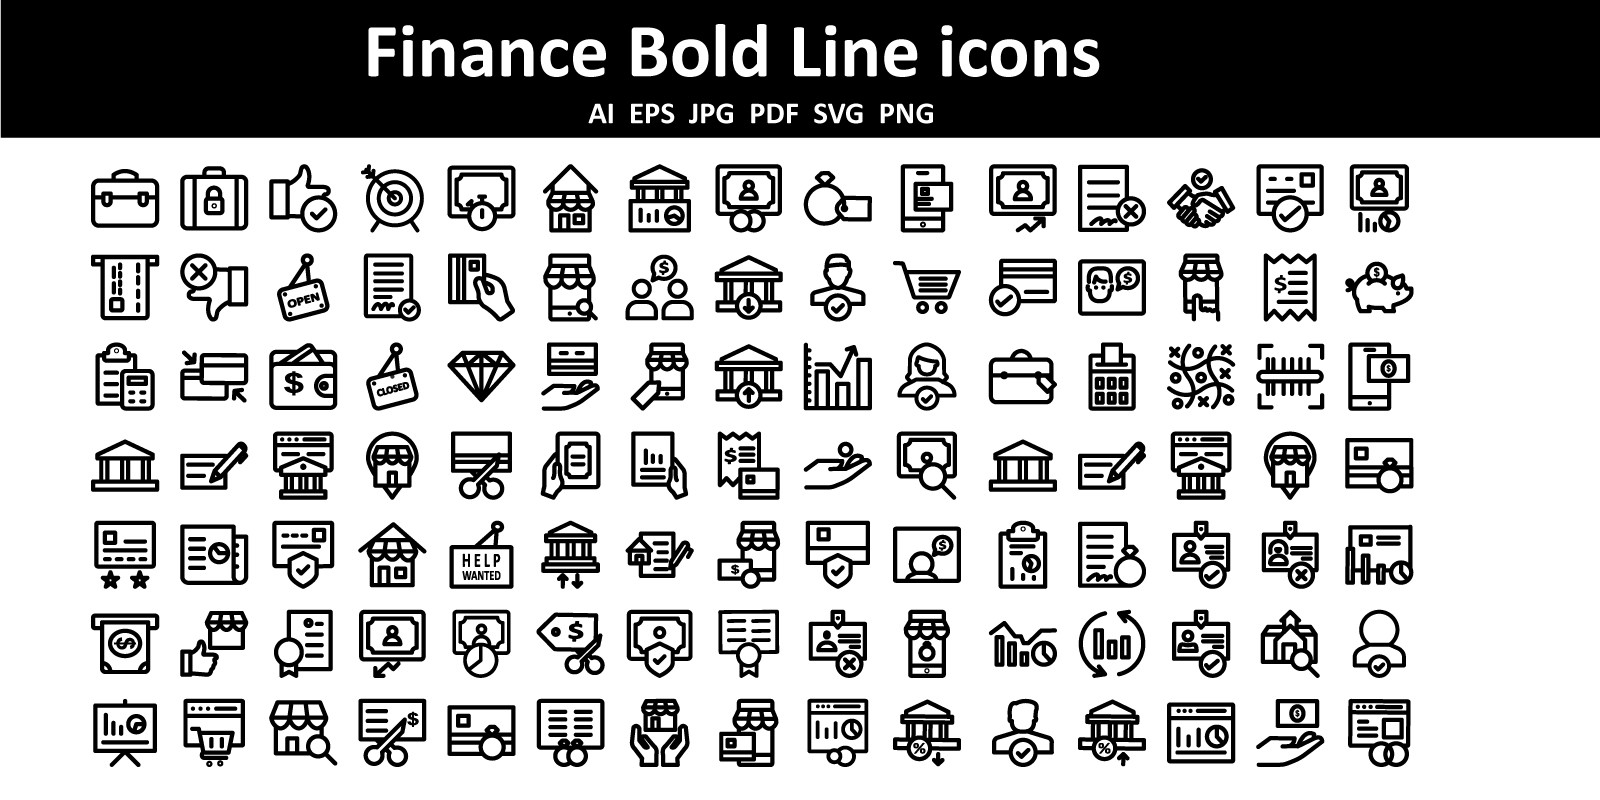 Finance Bold Line icons